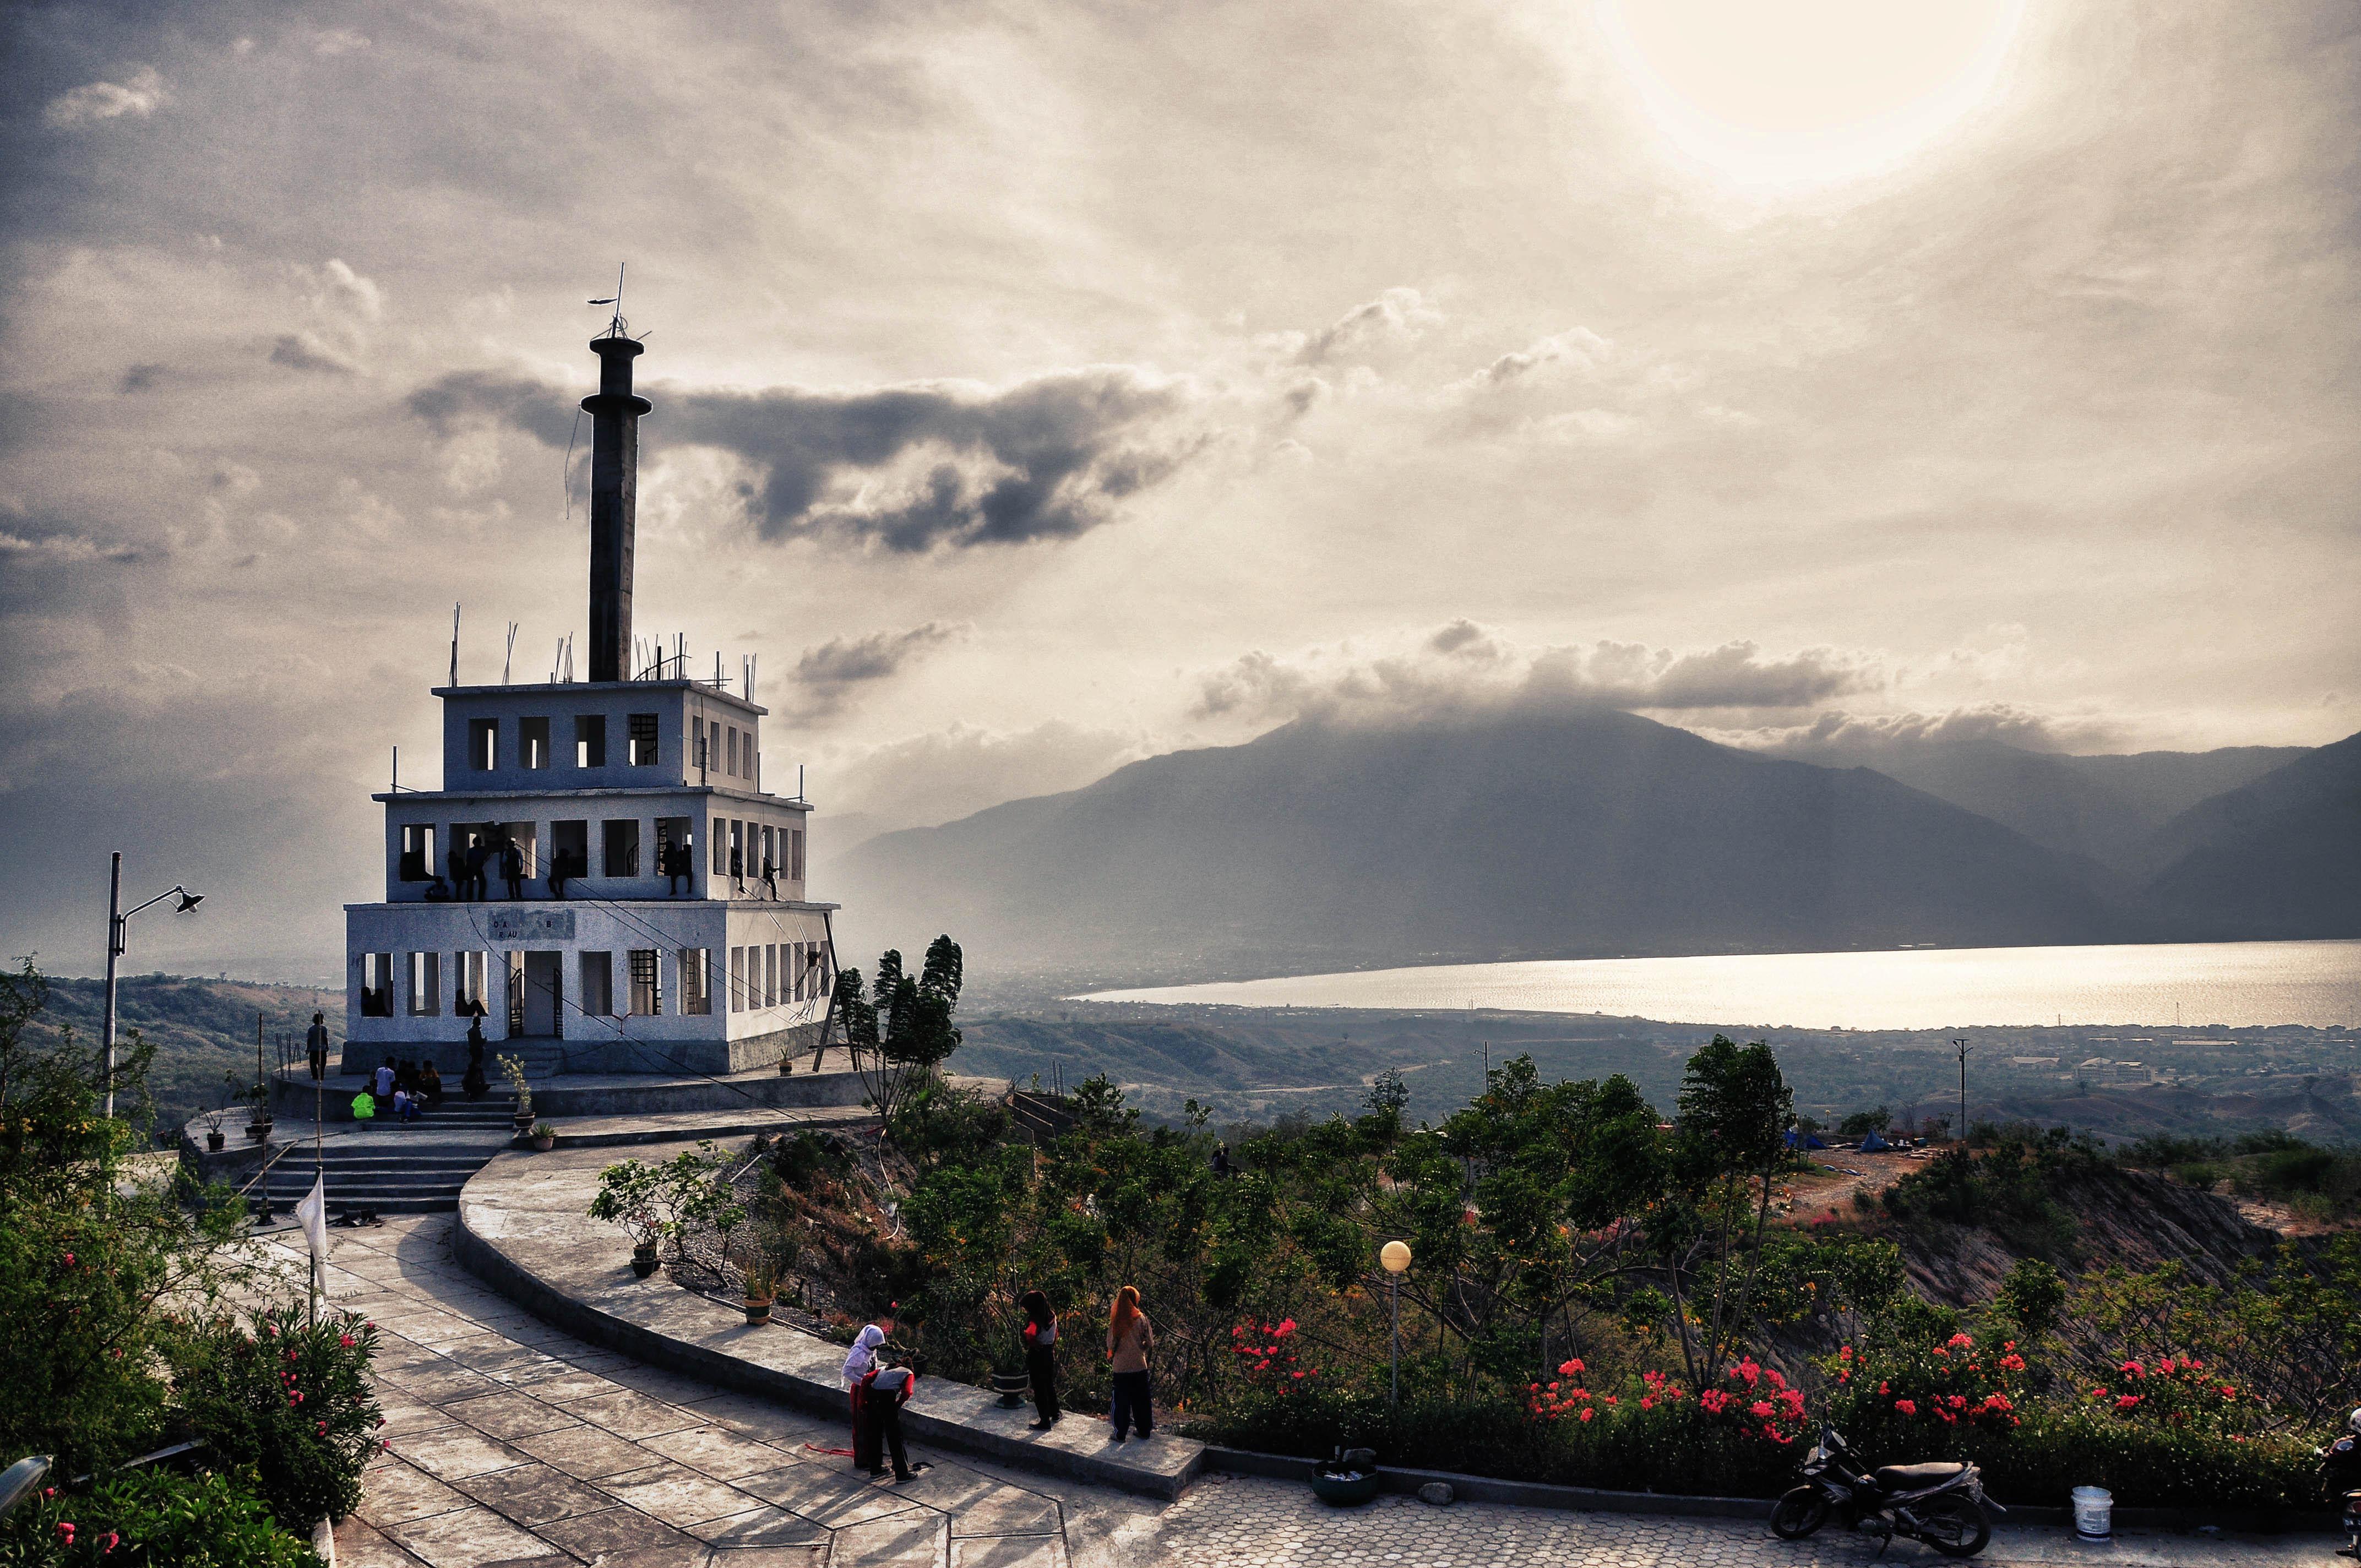 Menatap Dekat Tugu Perdamaian Nosarara Nosabatutu Topanjayo Gong Tp4 Kota